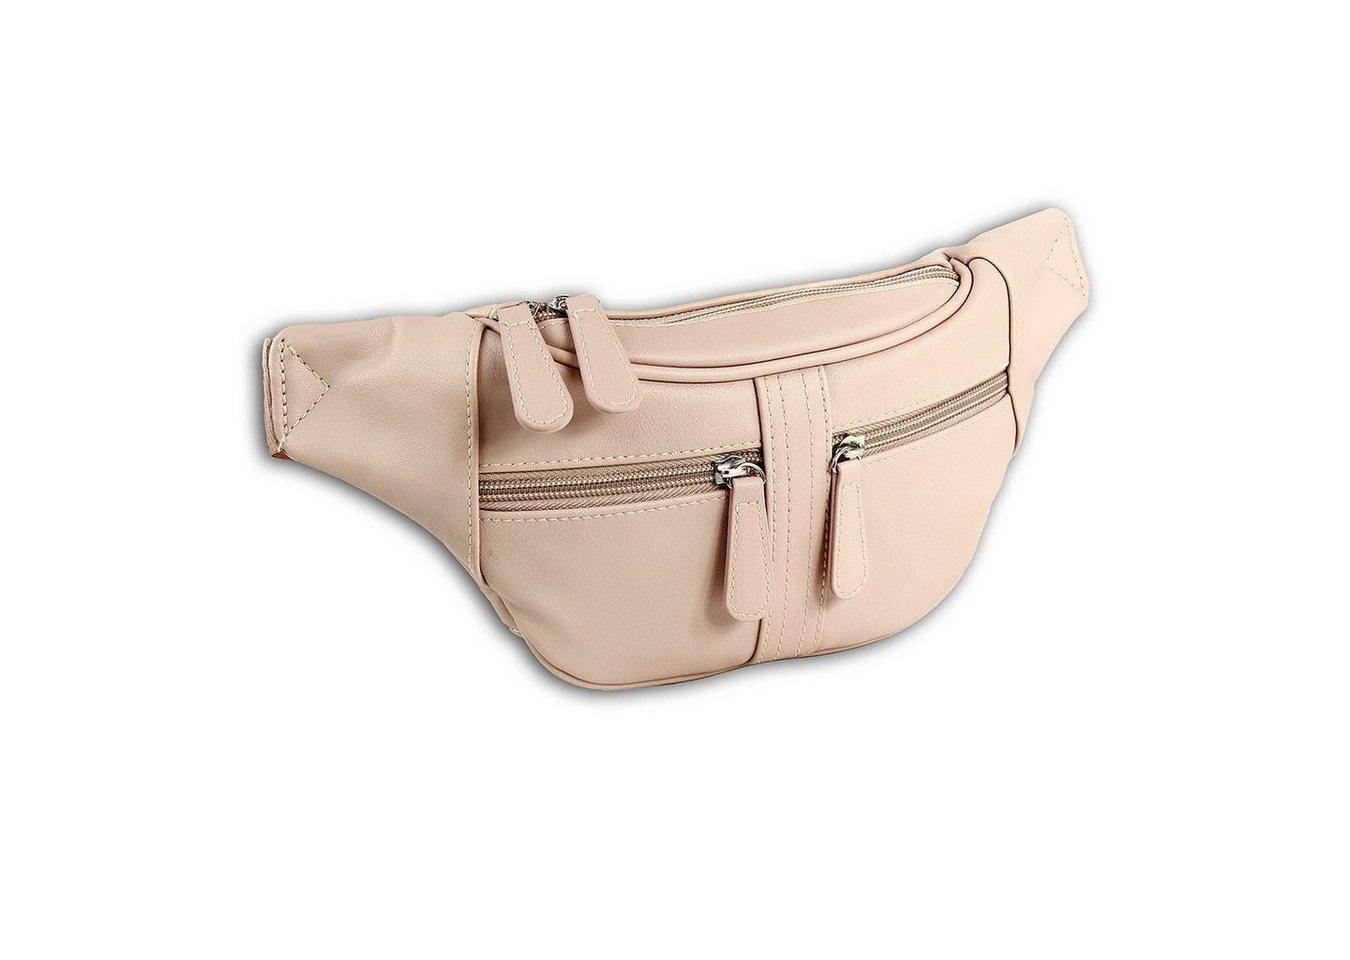 new bags -  Gürteltasche »OTD5023X  Damen Hüfttasche Gürteltasche« (Gürteltasche), Damen, Jugend Tasche nude, ca. 35cm x ca. 5cm